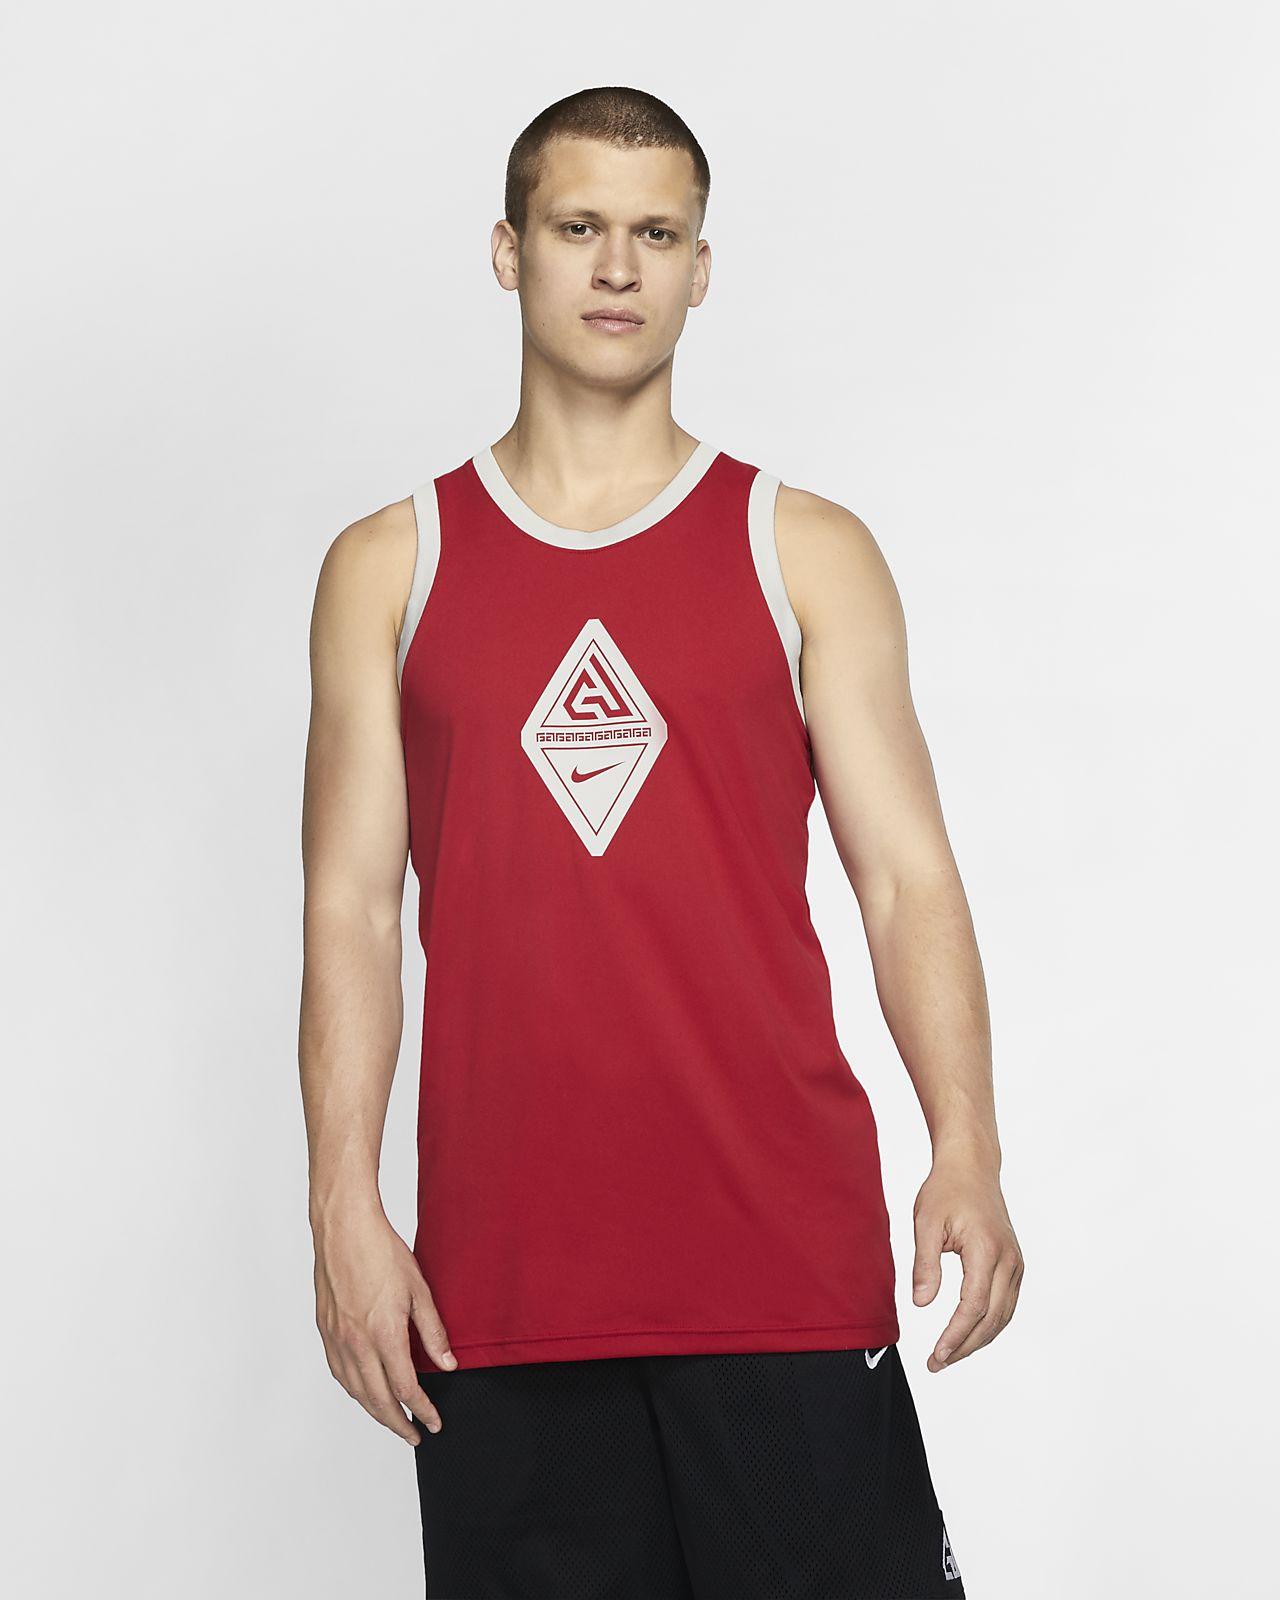 Canotta da basket senza maniche con logo Giannis - Uomo